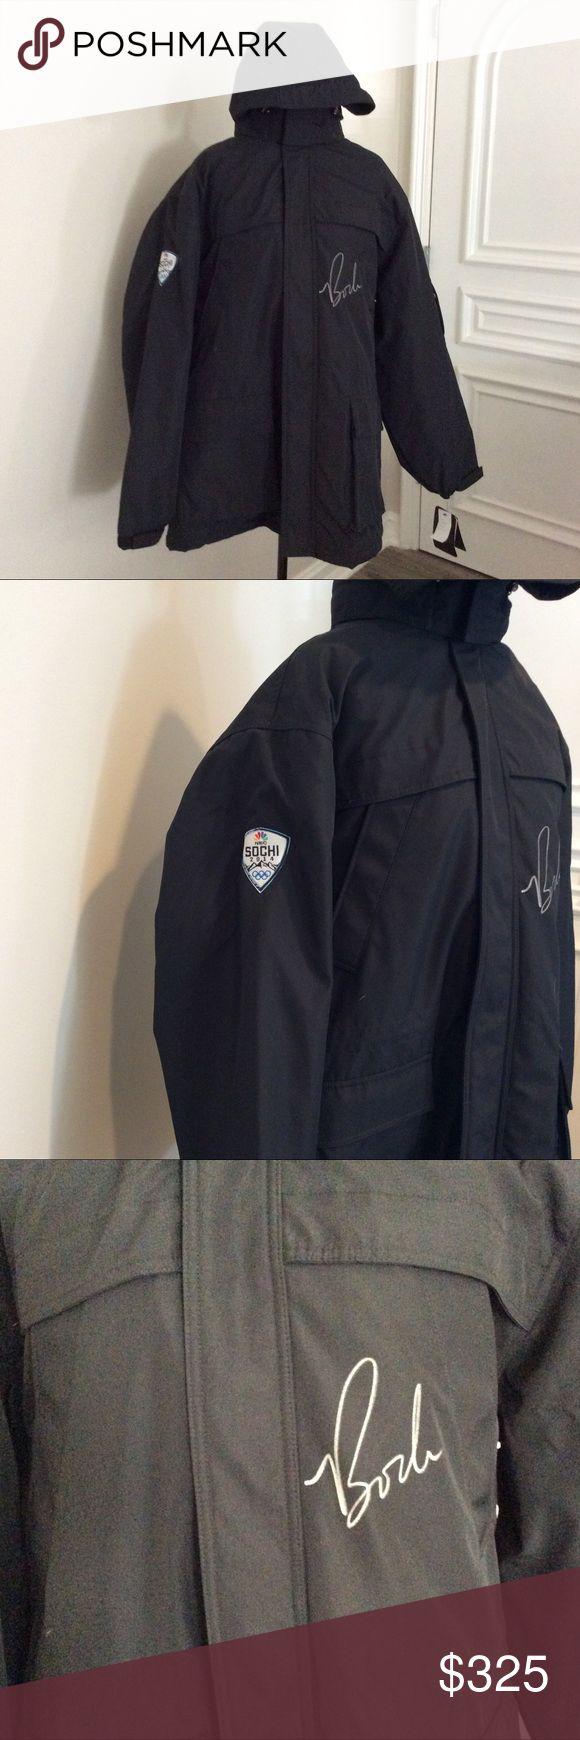 Men's WEATHERPROOF Black Jacket Brand New and signed by Bode Miller! Weatherproof Jackets & Coats